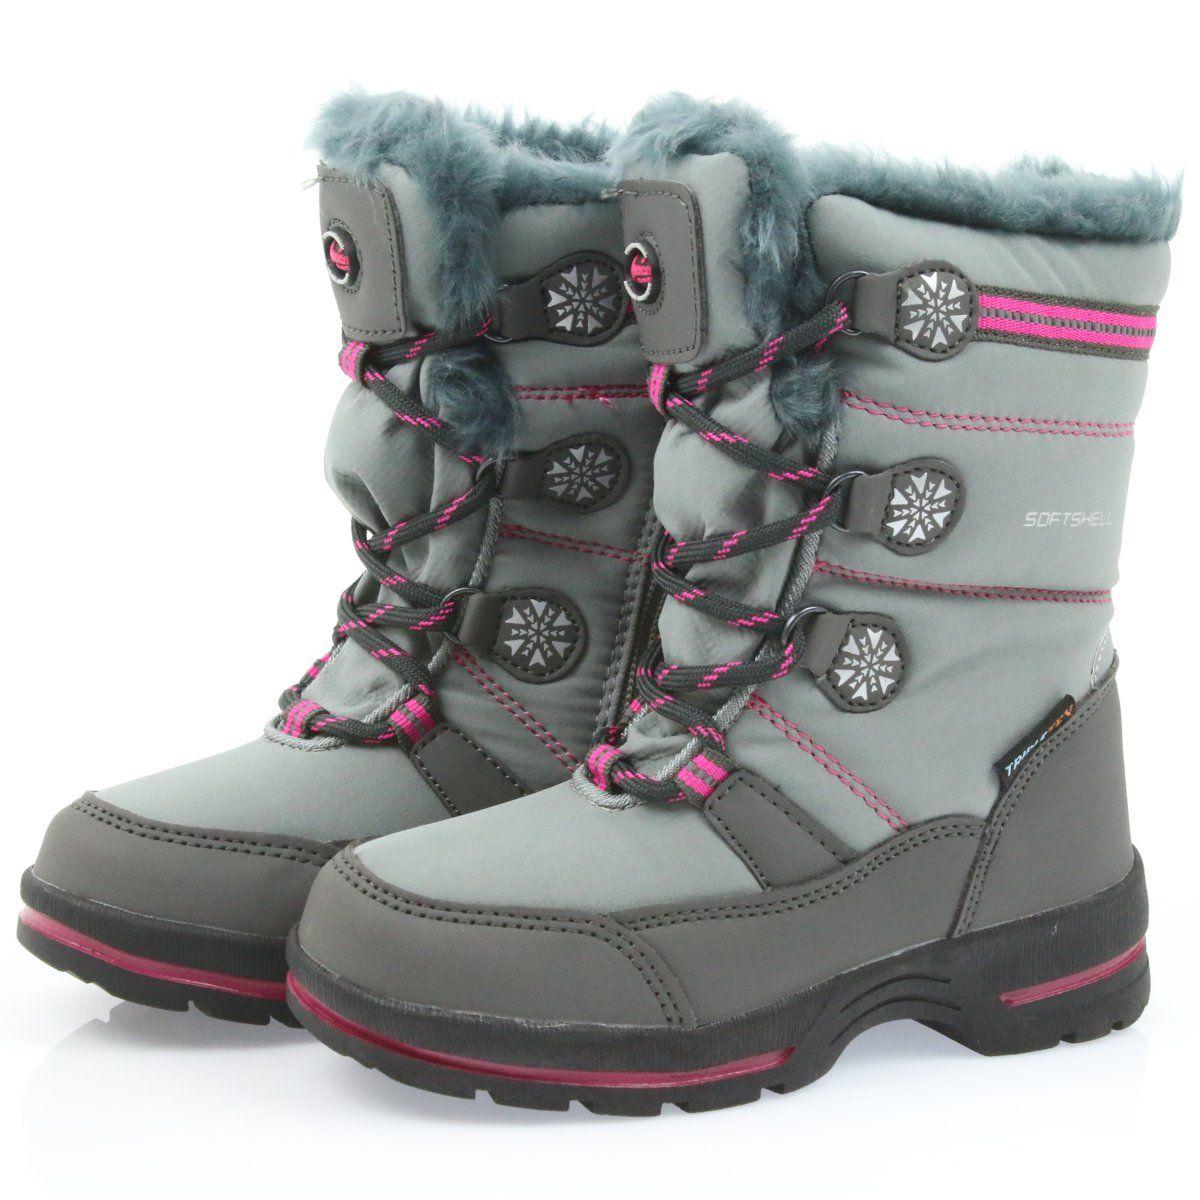 American Club American Buty Zimowe Z Membrana 702sb Szare Rozowe Boots Shoes Winter Boot